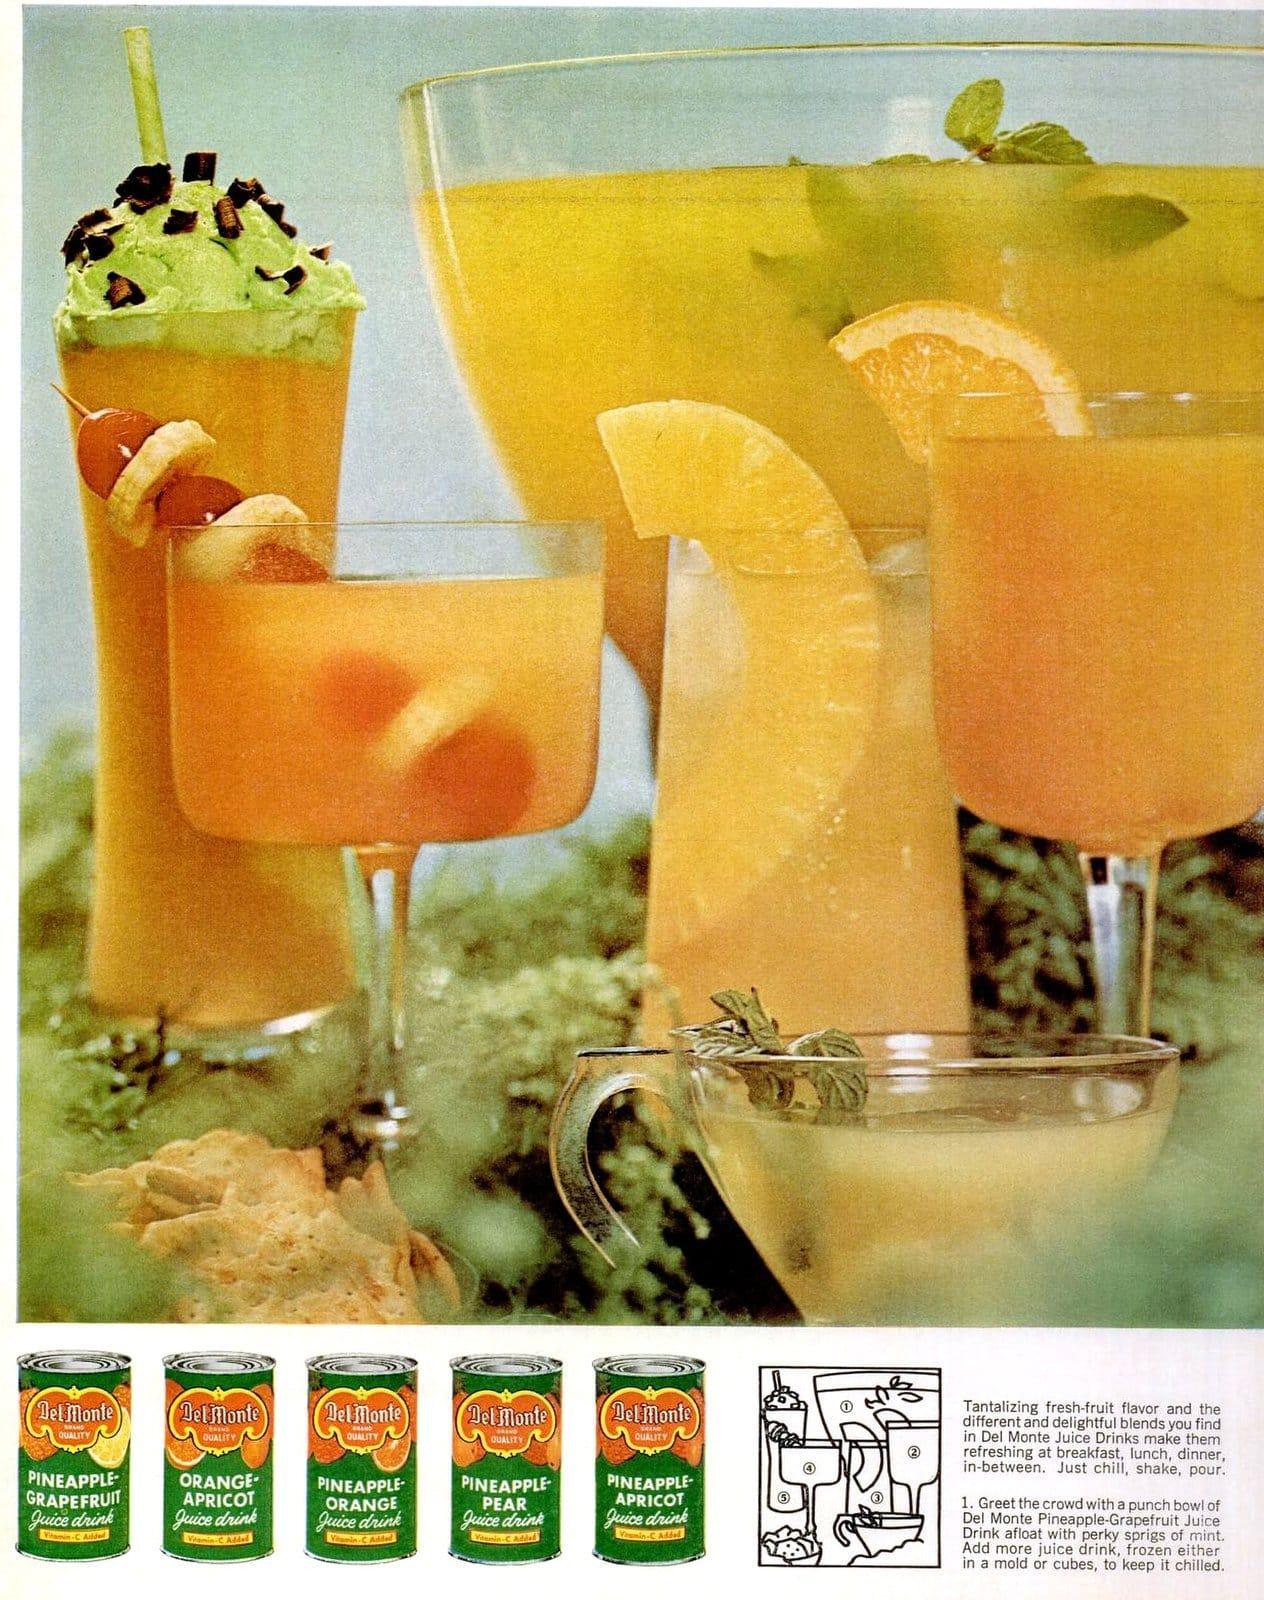 Fruity pineapple juice drinks (1965)